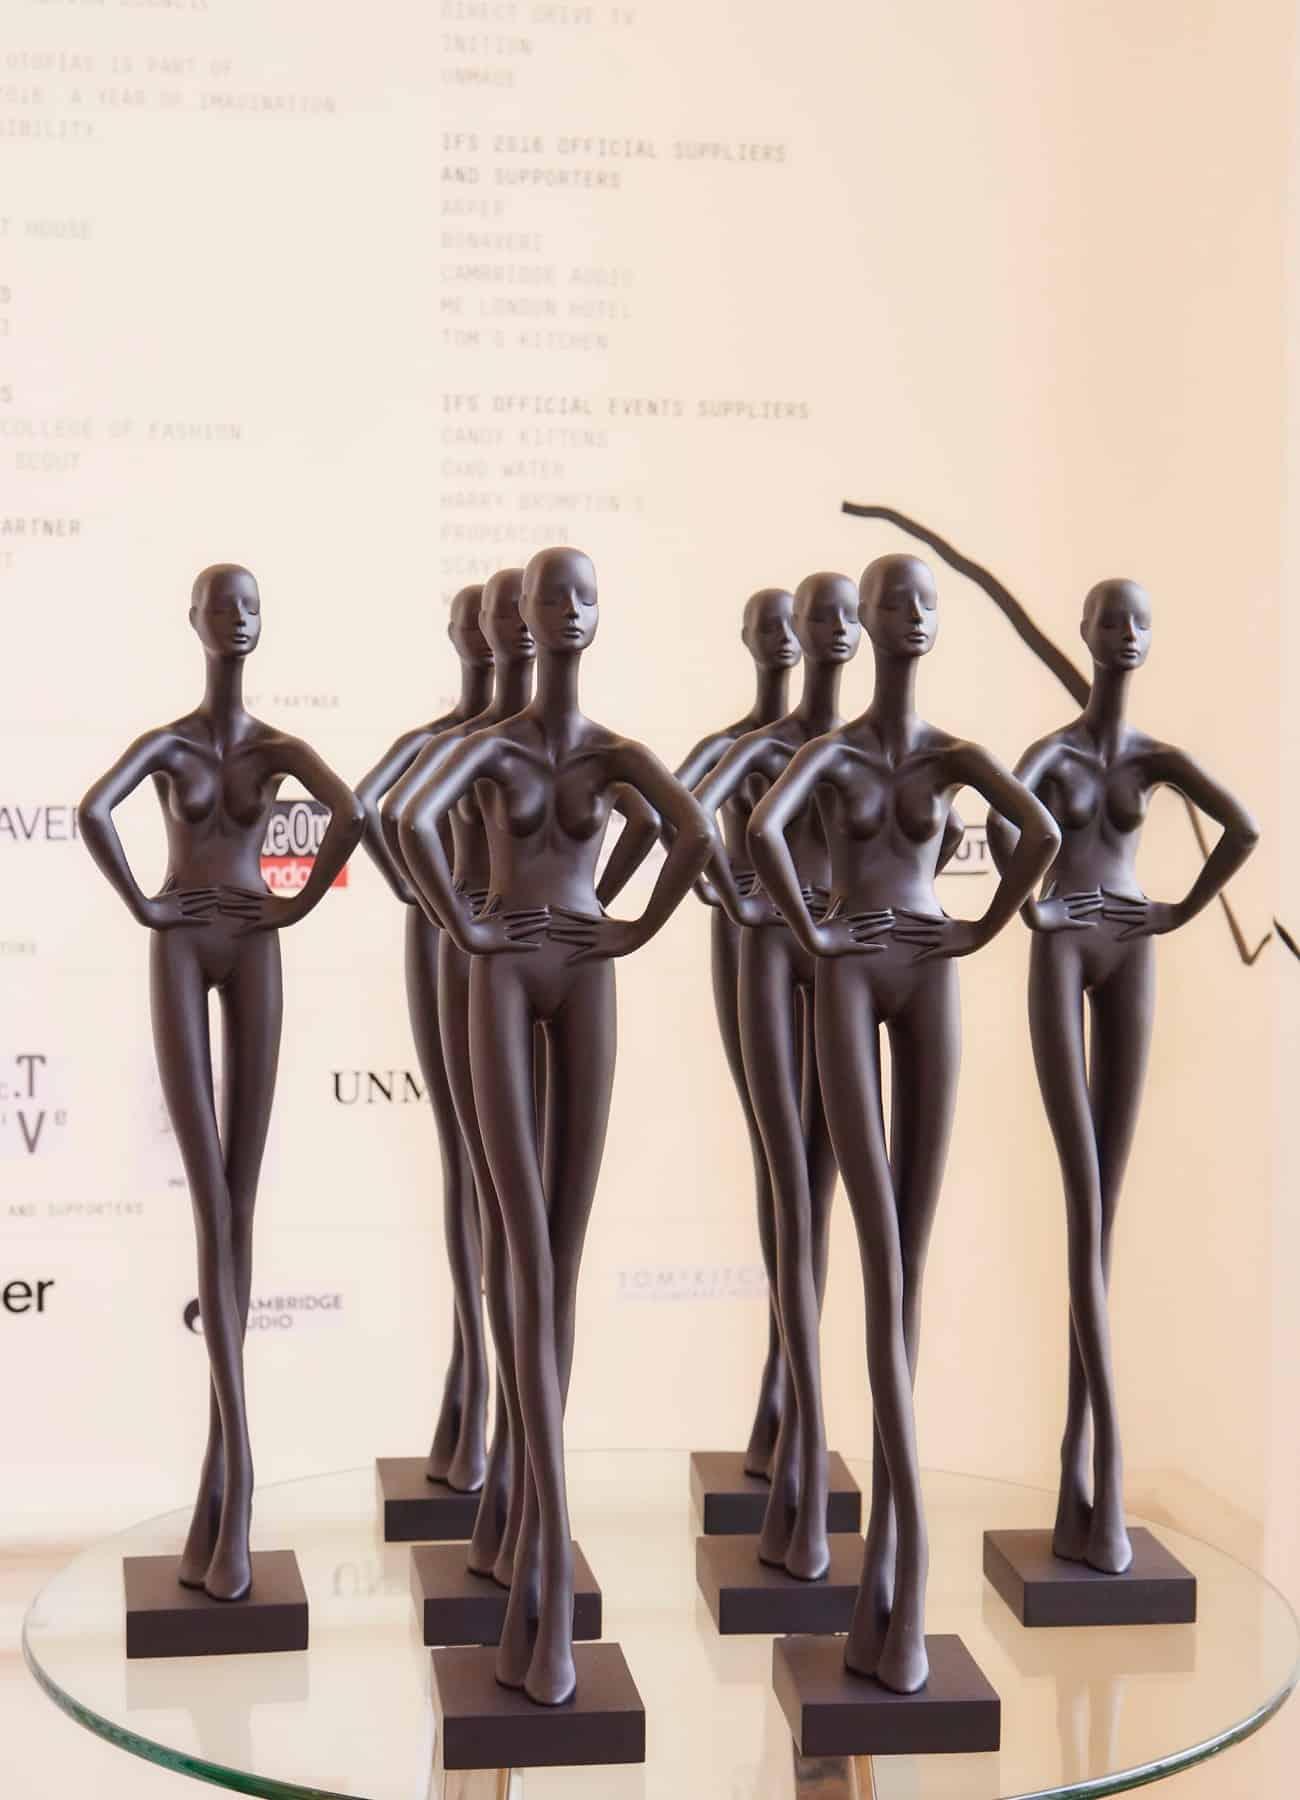 mini Aloof mannequins ifs16 curator award 2016